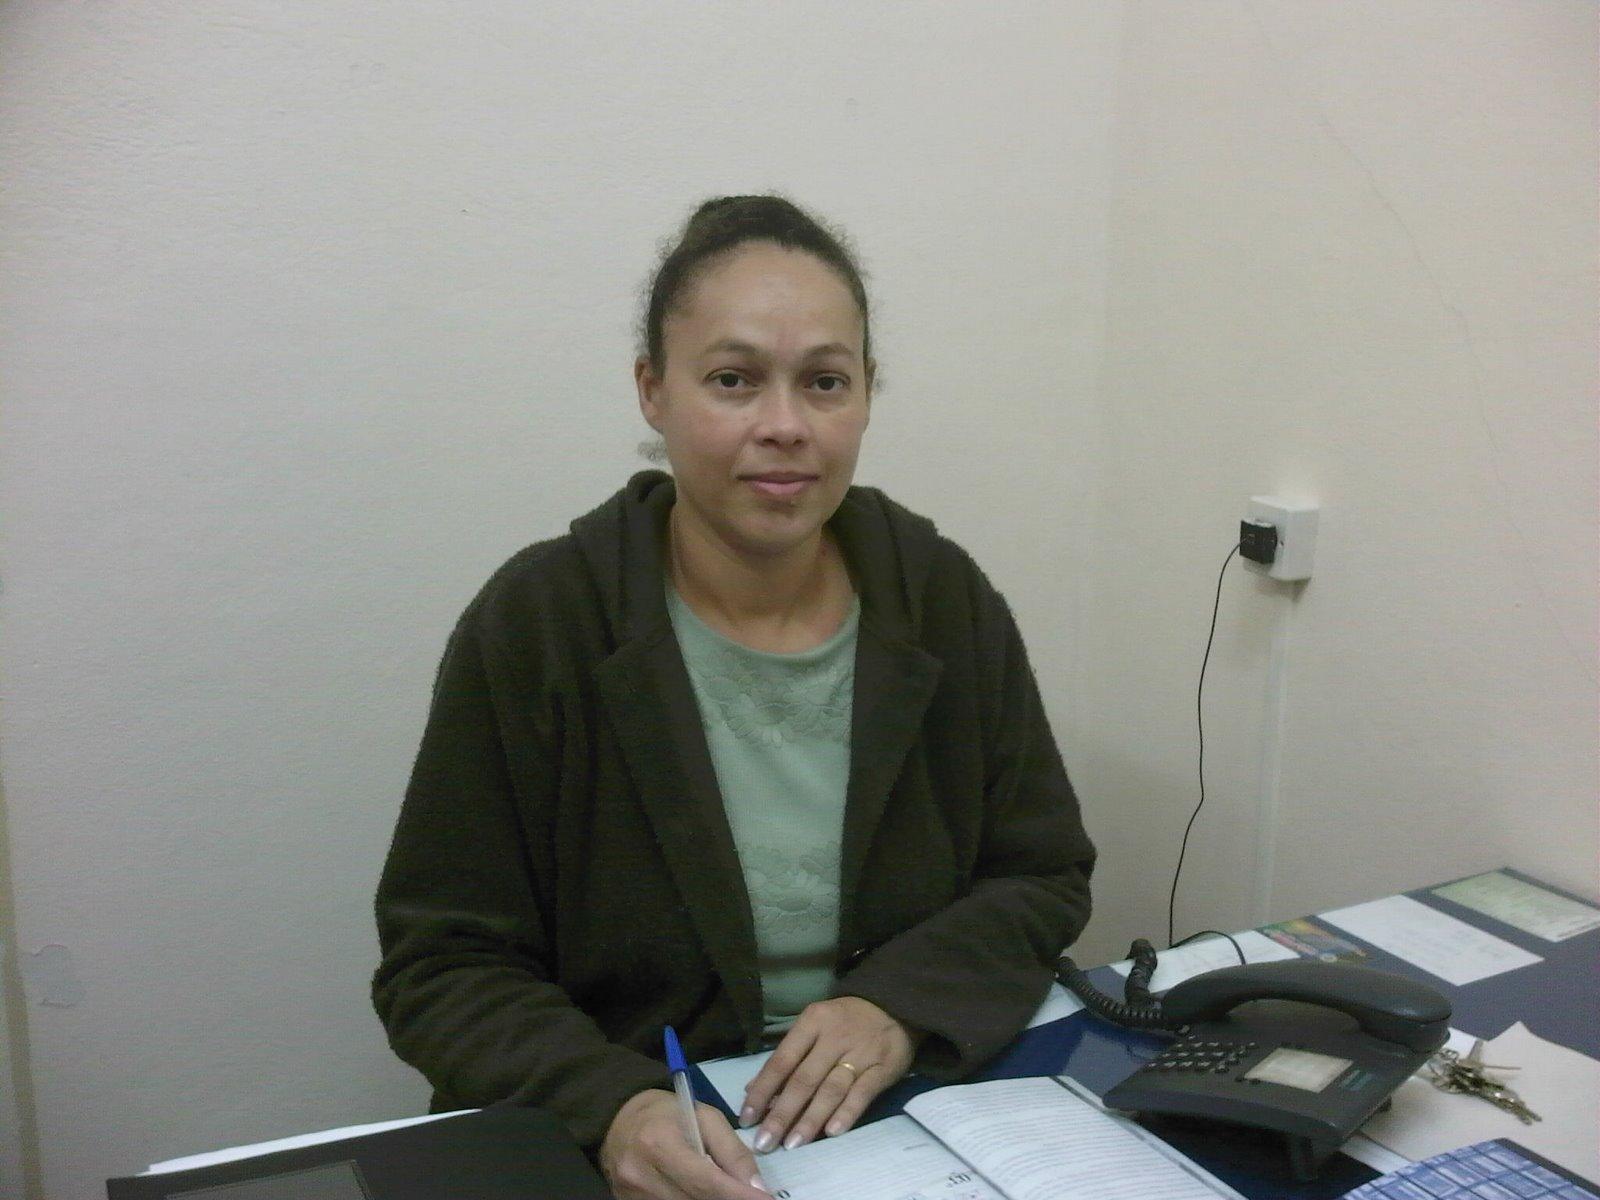 Maria de Lourdes Teixeira Net Worth